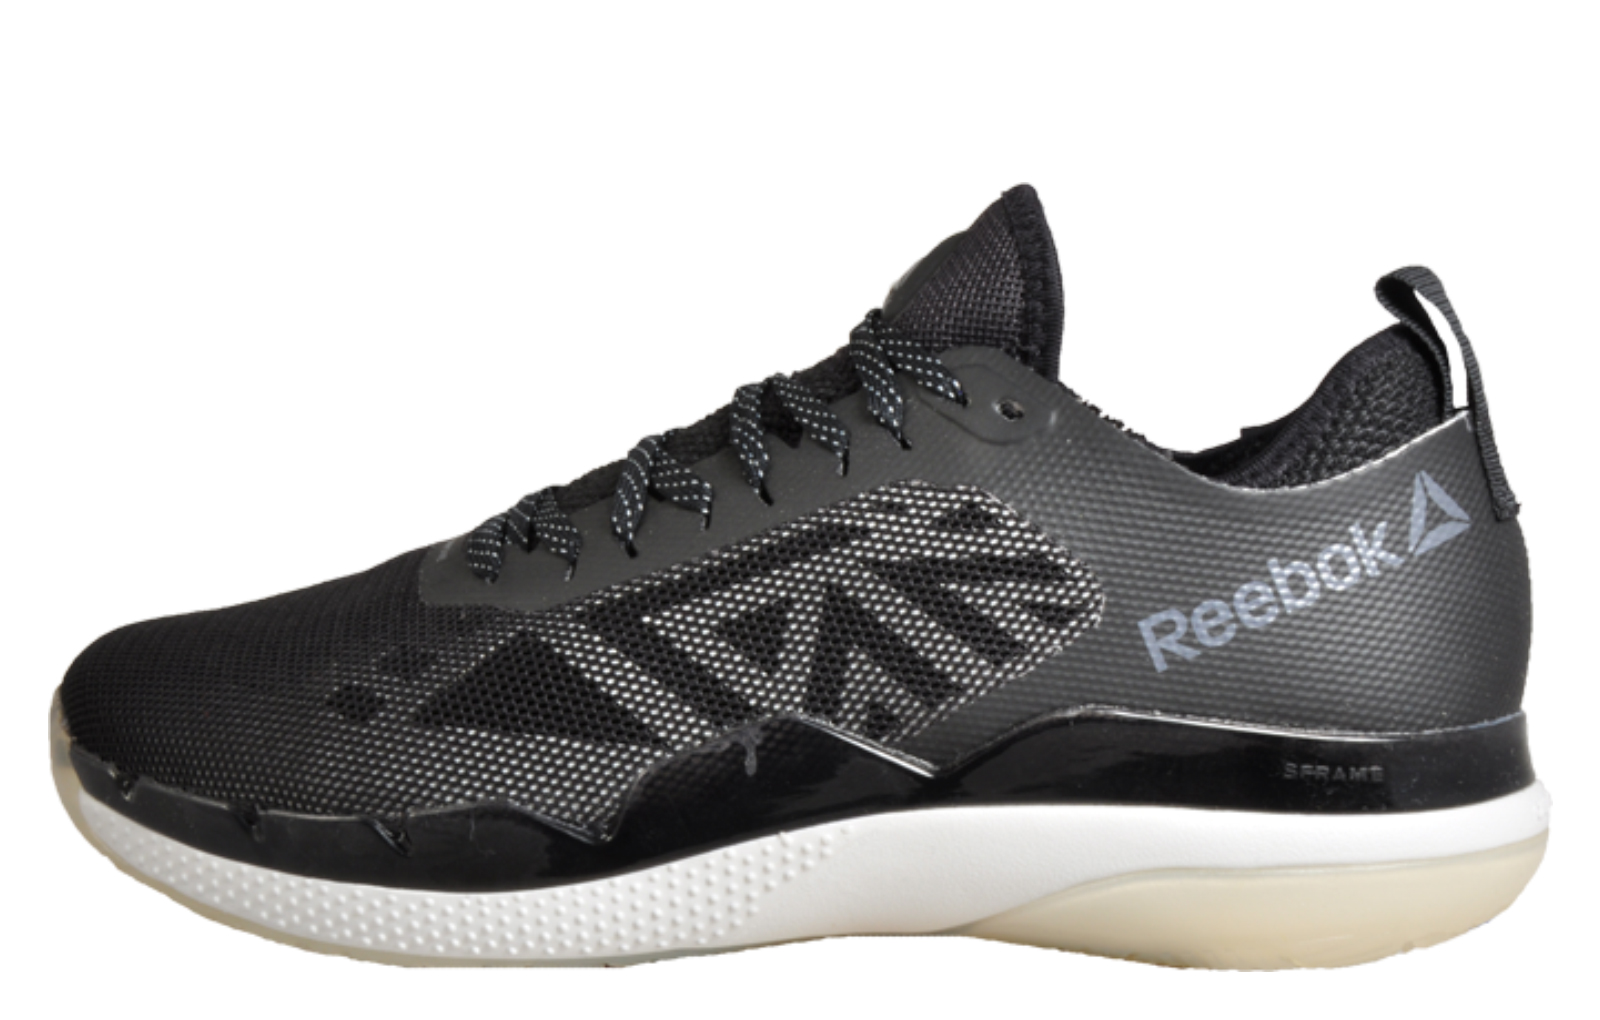 Reebok Cardio Ultra 3.0 Womens. Black   Skull Grey   Ash Grey. Reebok  Cardio Ultra 3.0 Womens ... 405de12f8